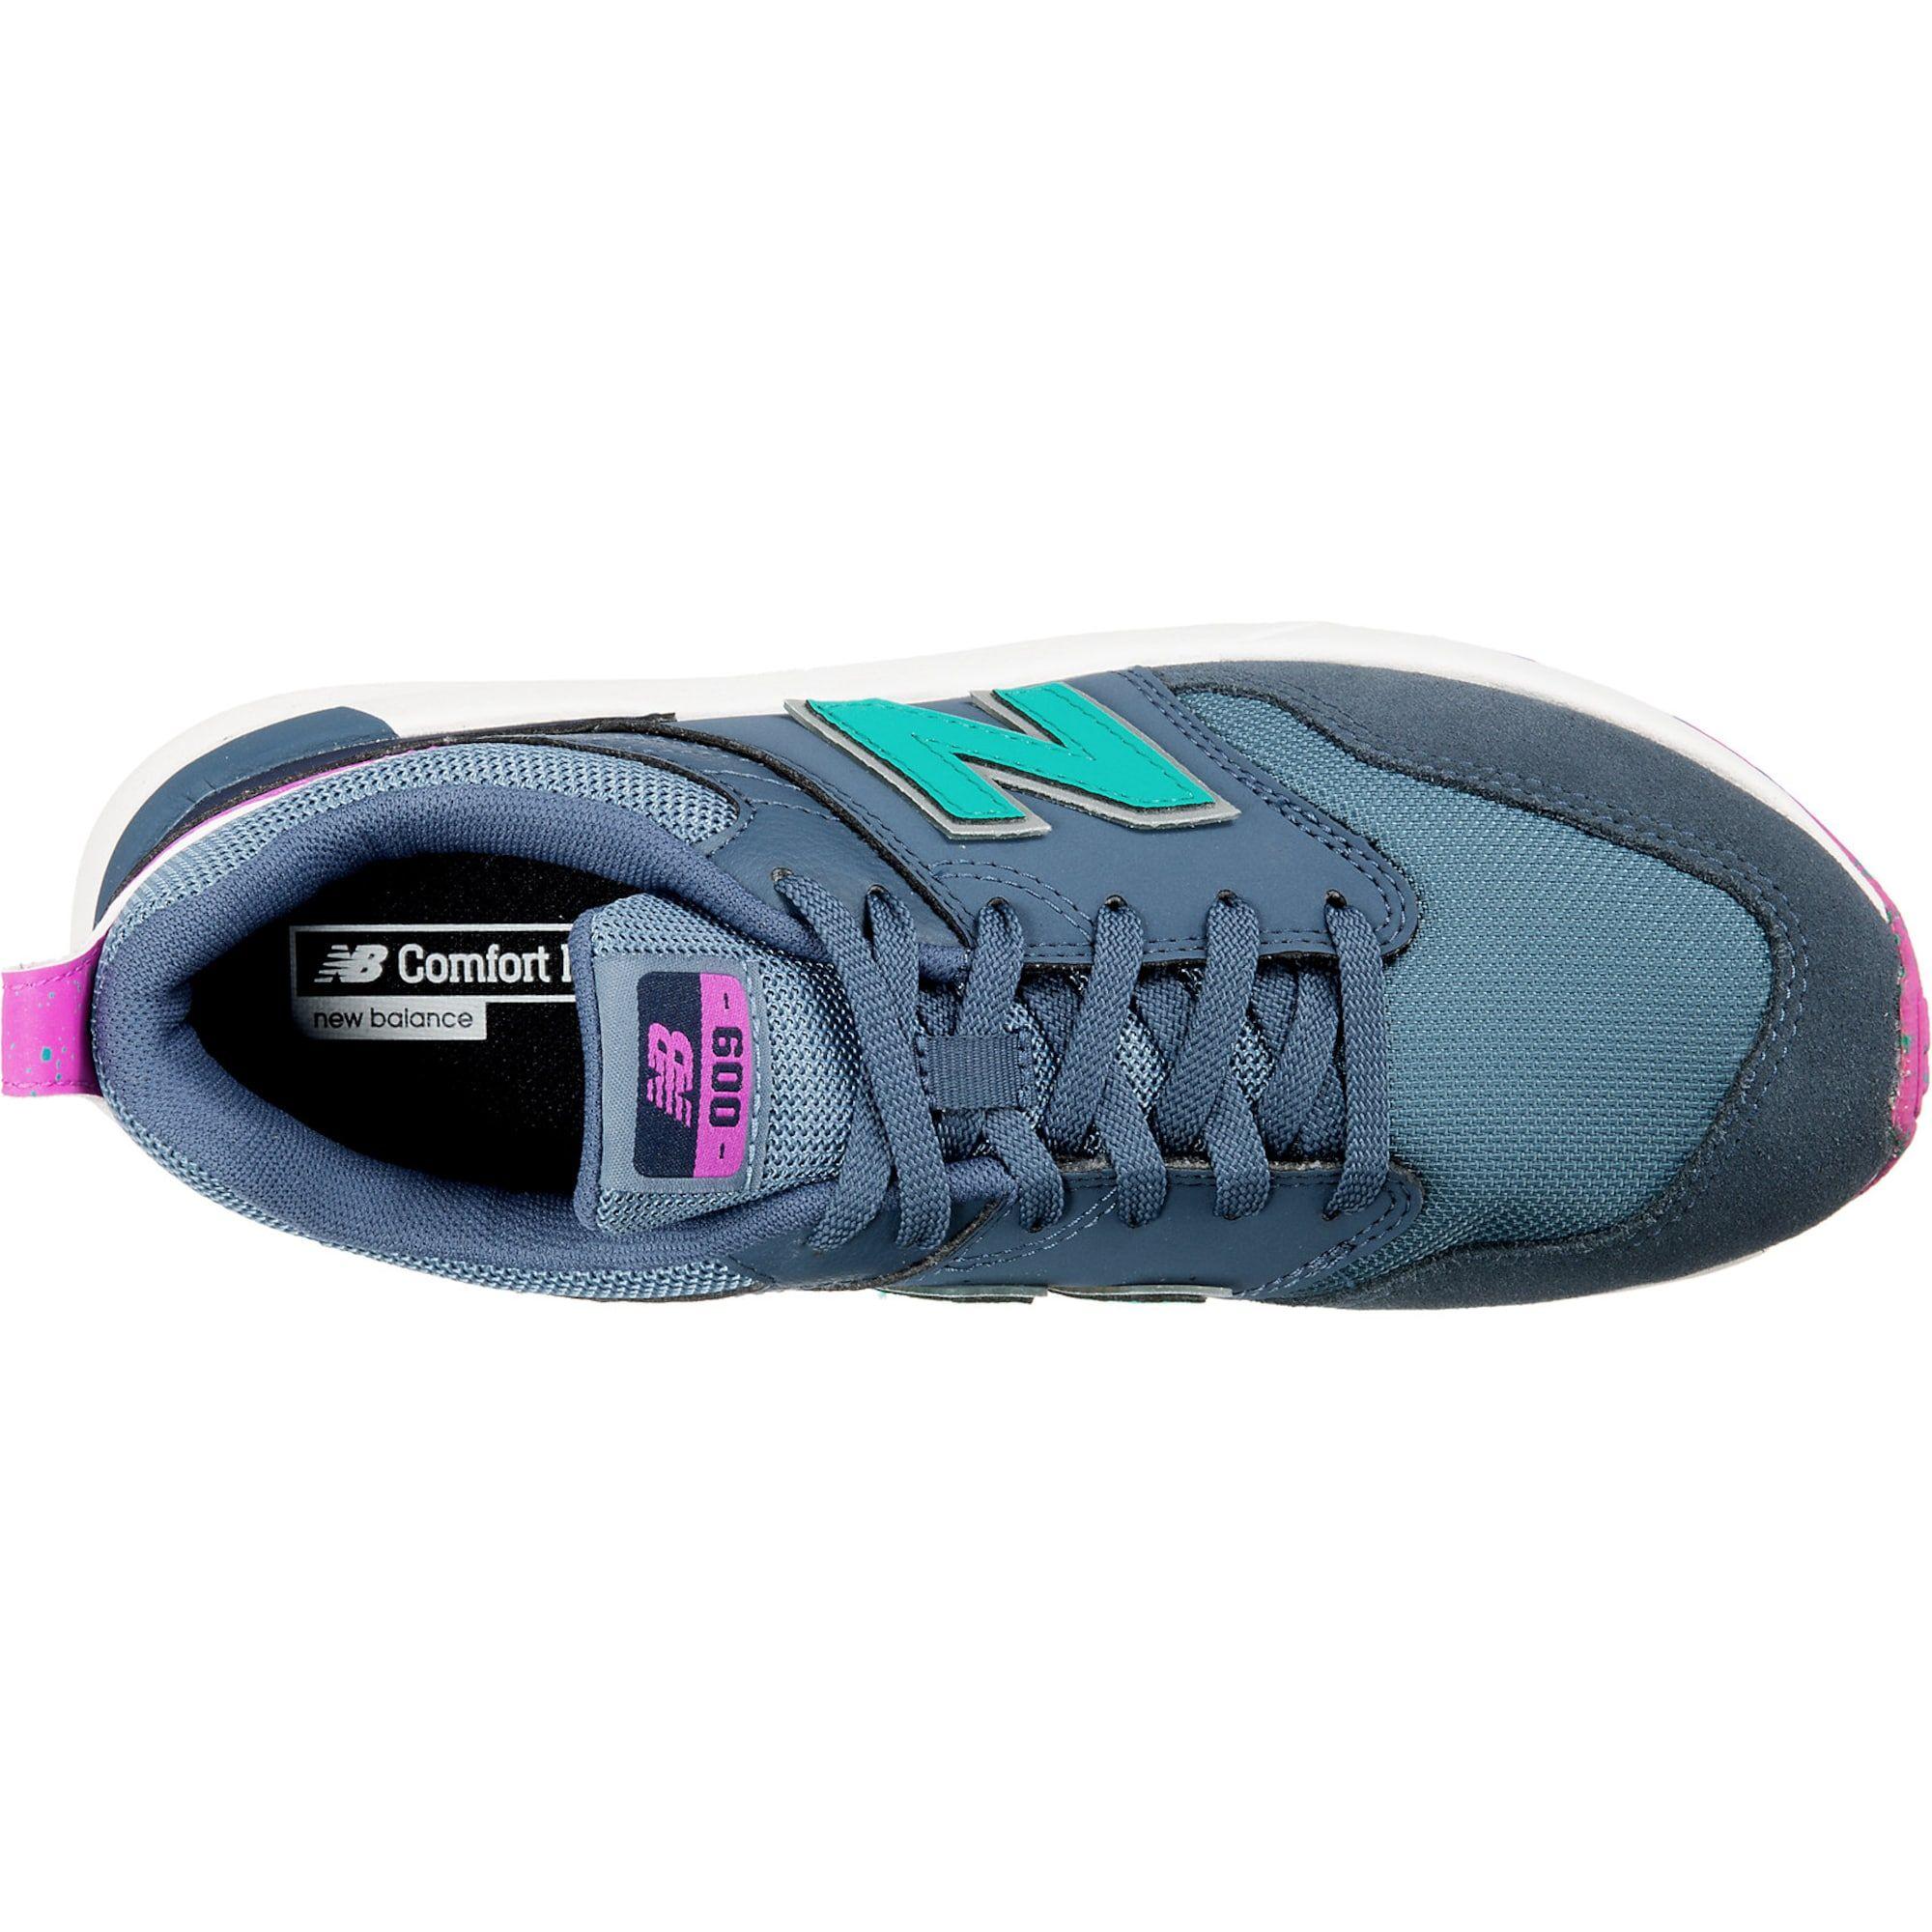 New Balance Sneakers 'Ws009om1' Damen, Blau / Türkis ...